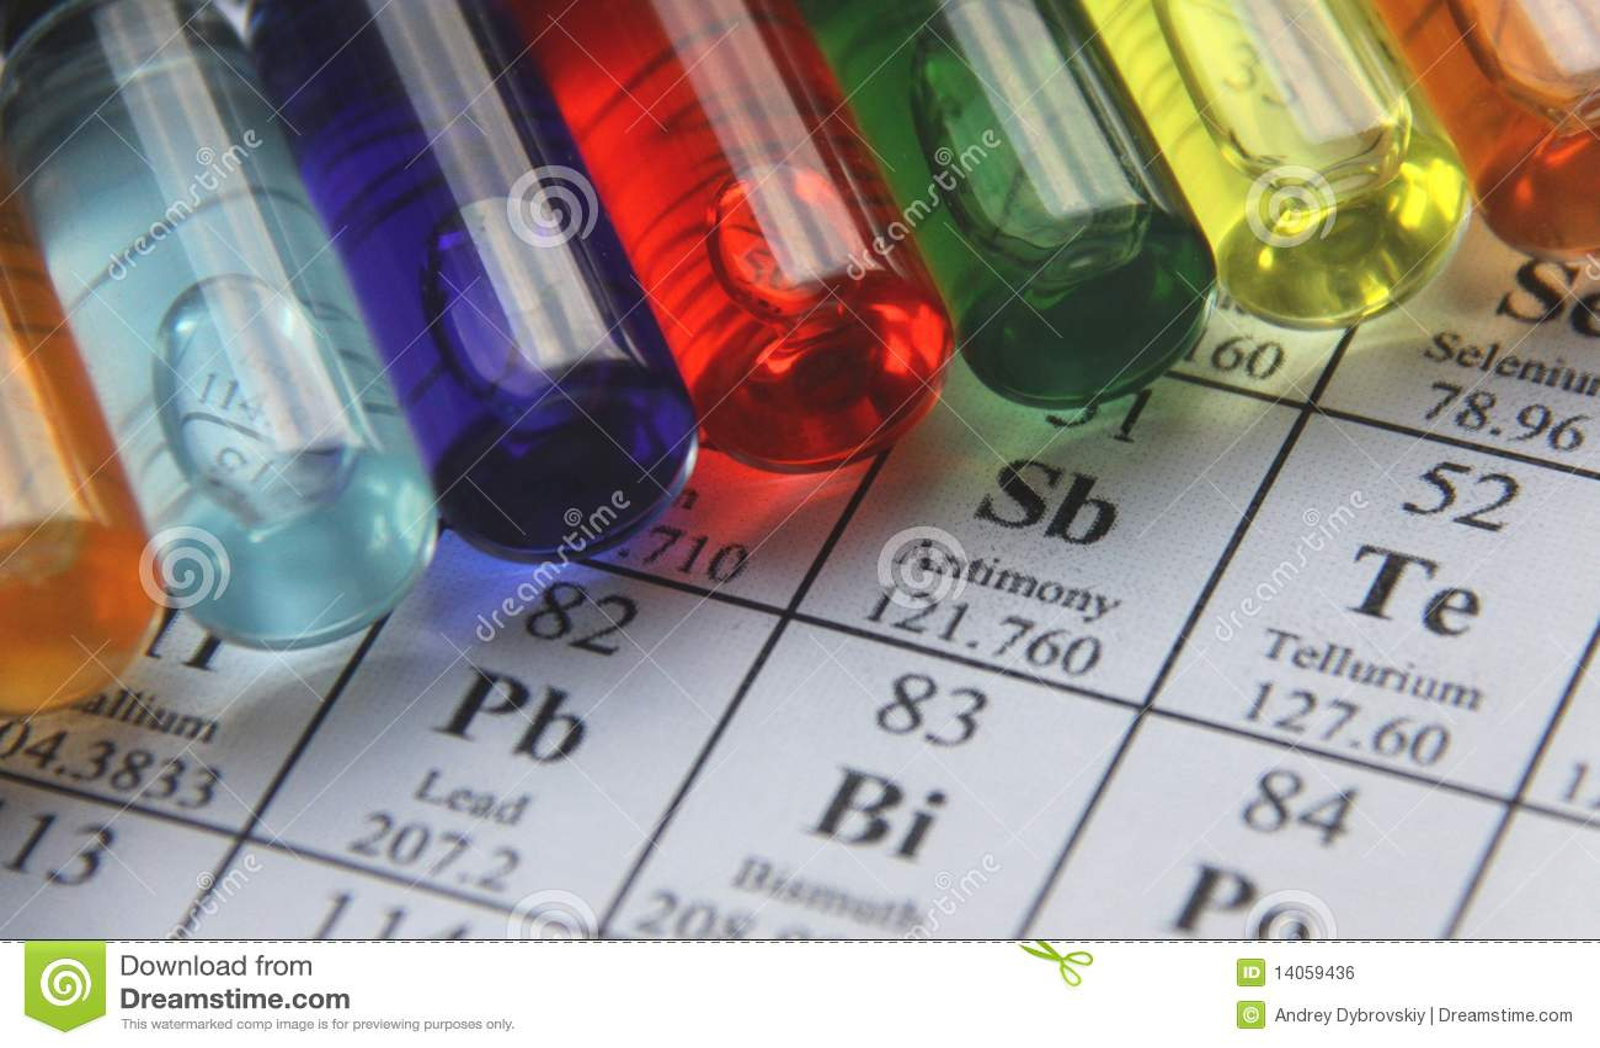 Chemie. Reagenzglasserie